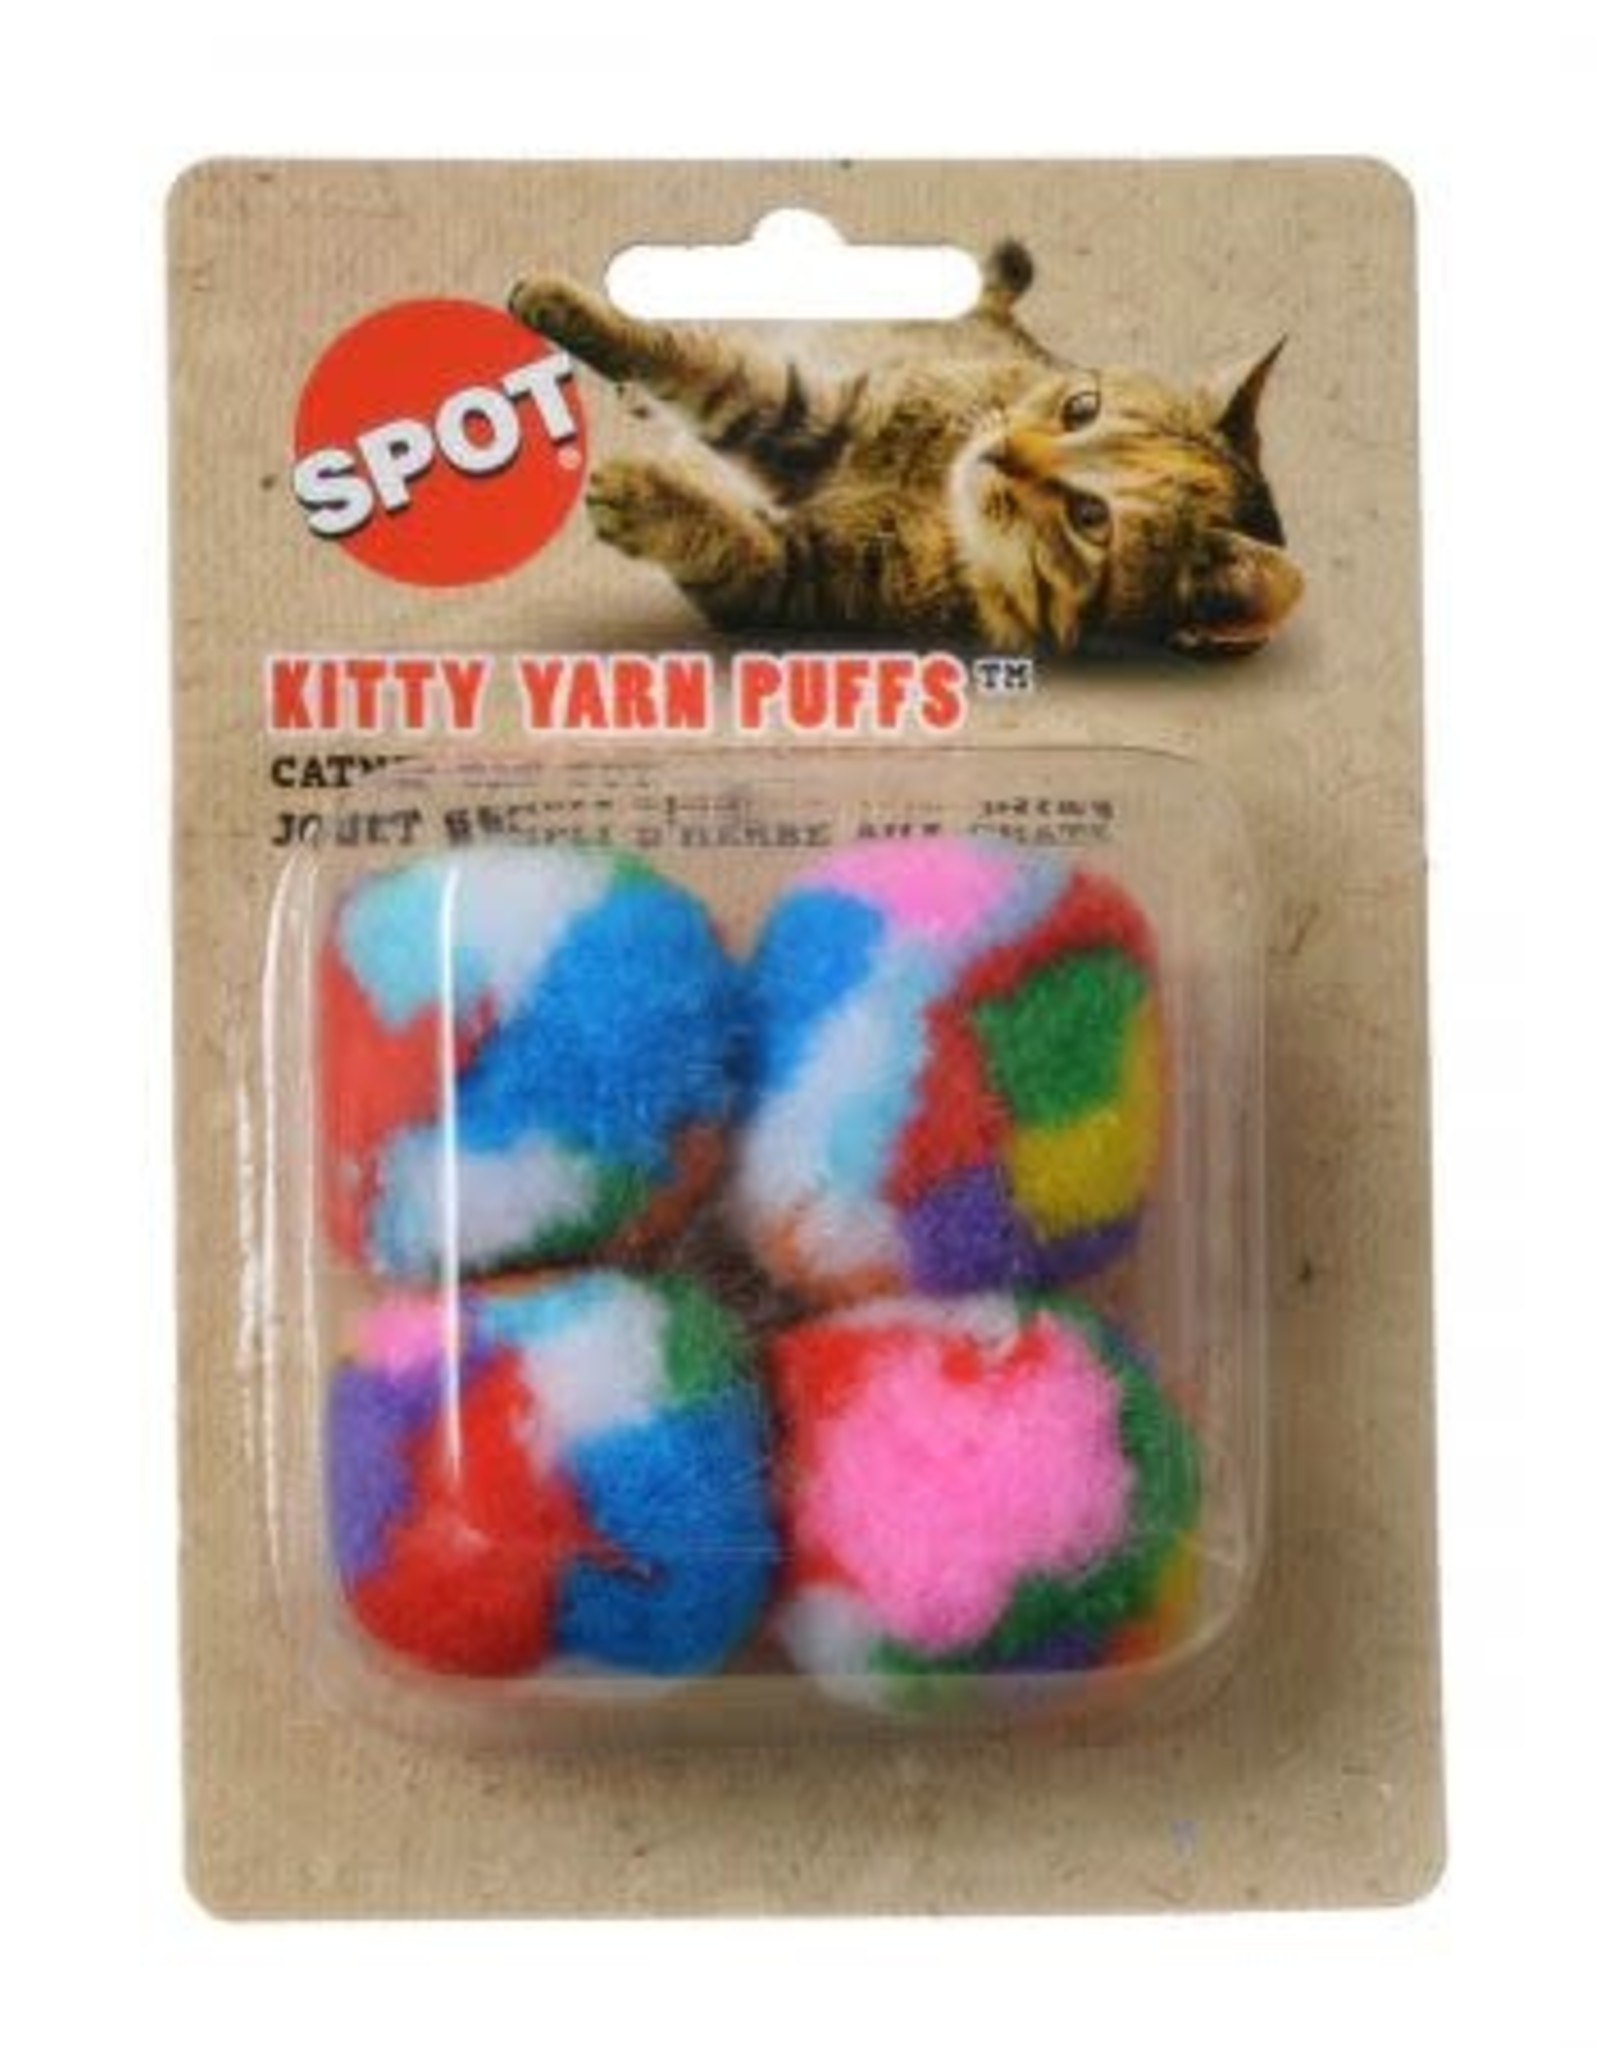 Spot Kitty Yarn Puffs Catnip Balls